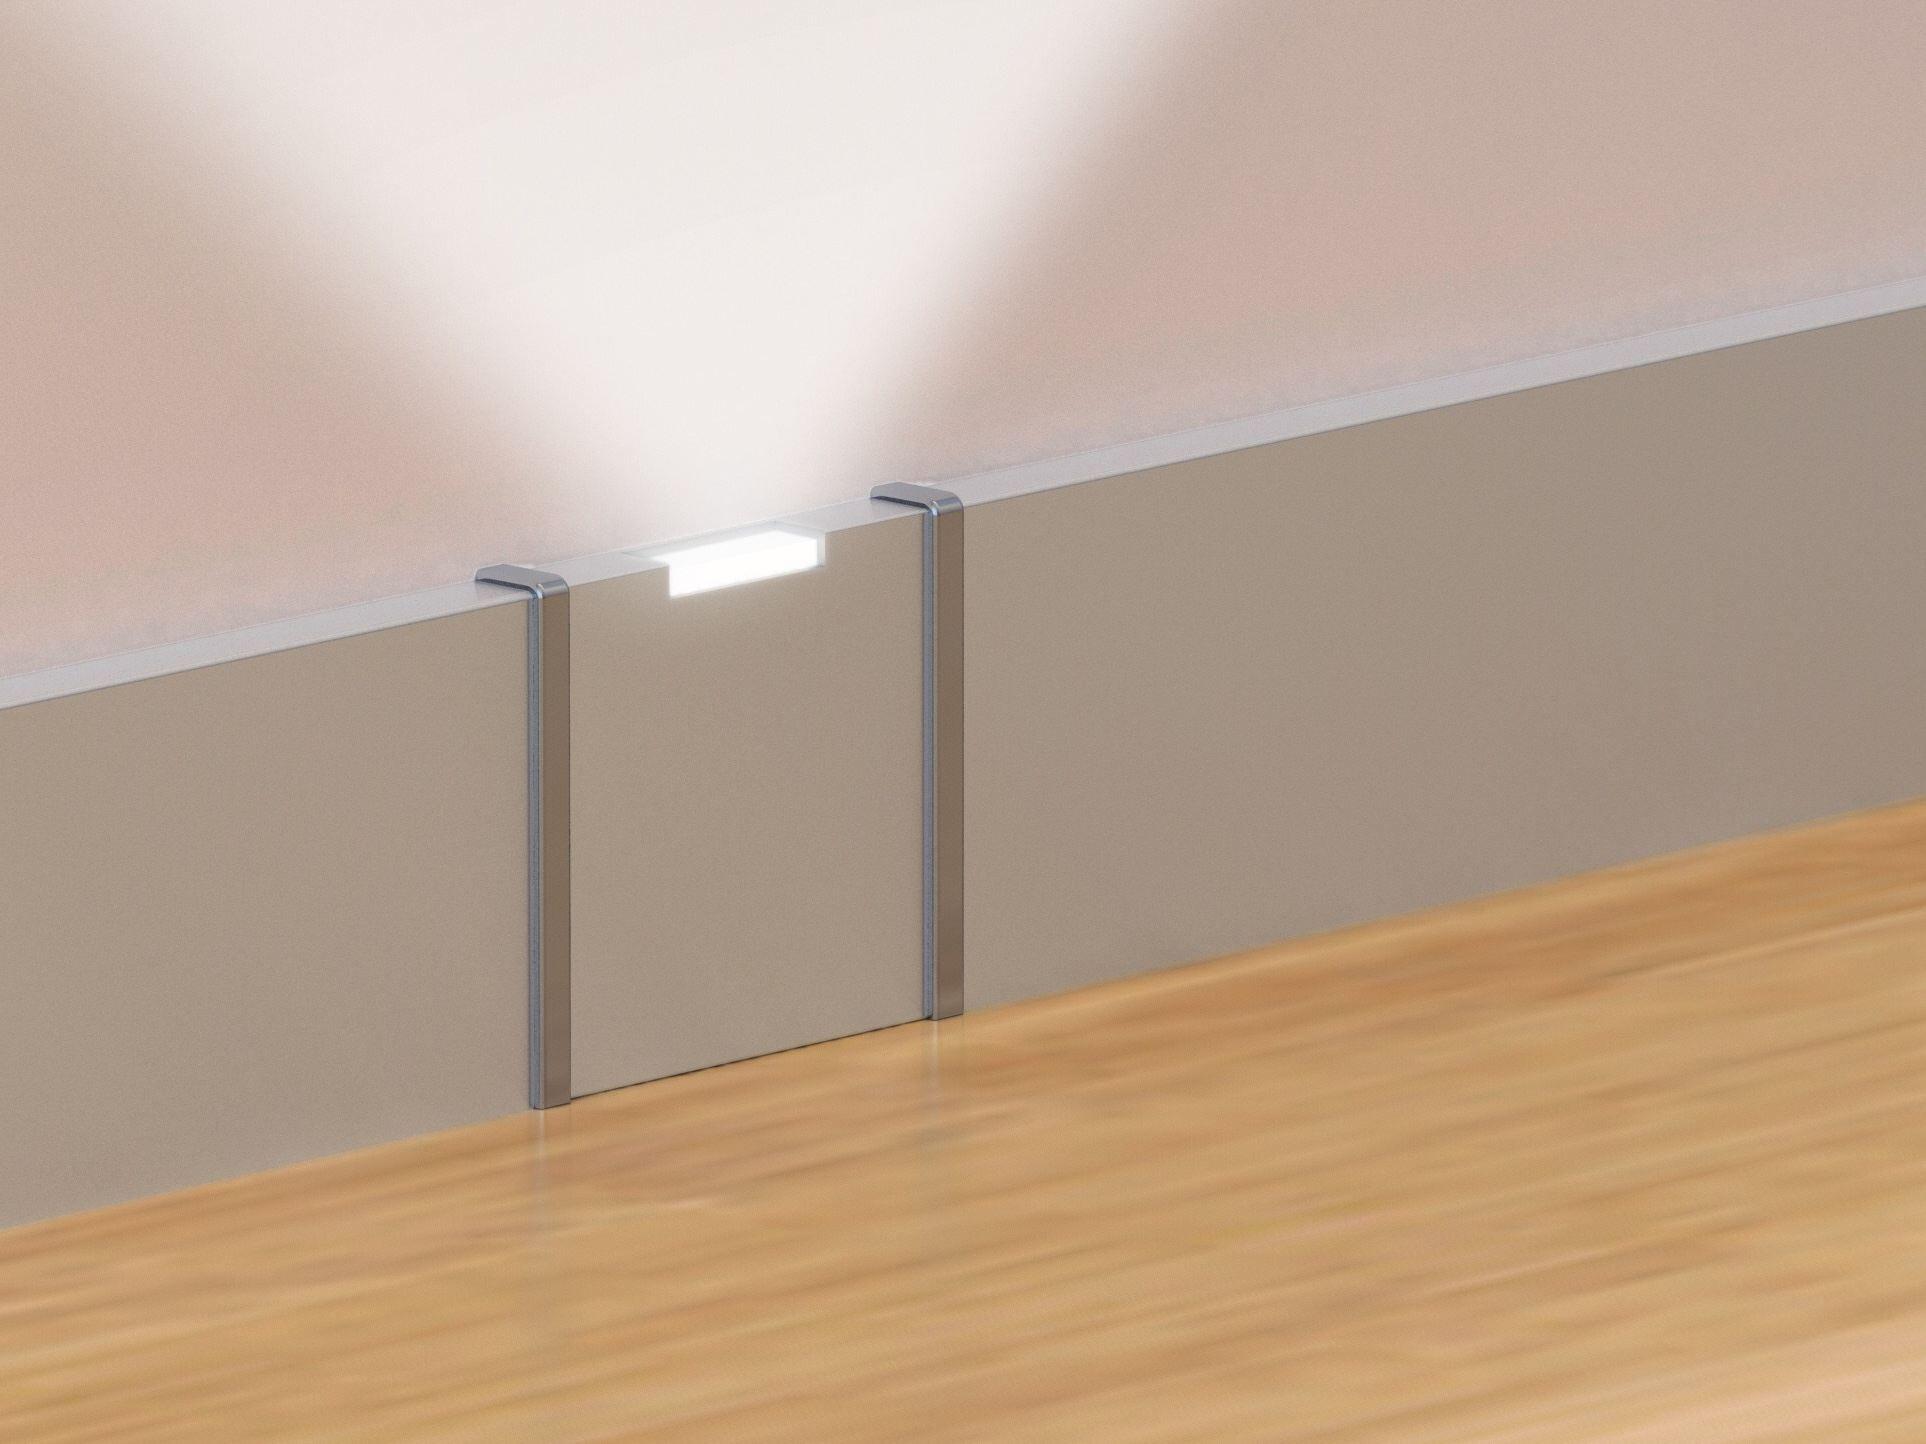 fu leiste aus aluminium mit led licht prolight iceberg kollektion prolight by profilpas. Black Bedroom Furniture Sets. Home Design Ideas